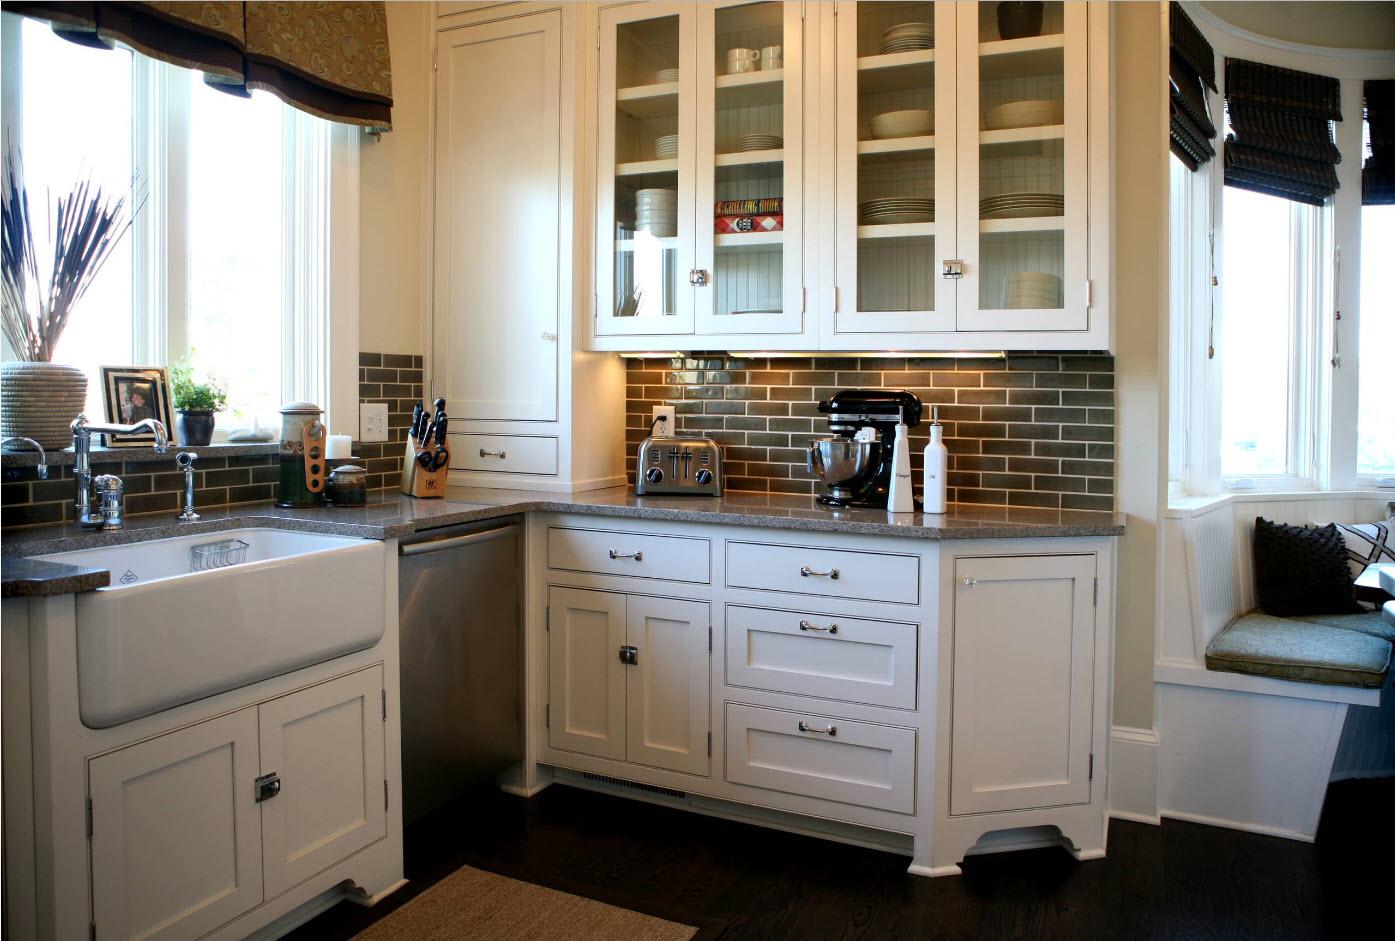 White l-hsaped kitchen with nice brickwork imitating backsplash